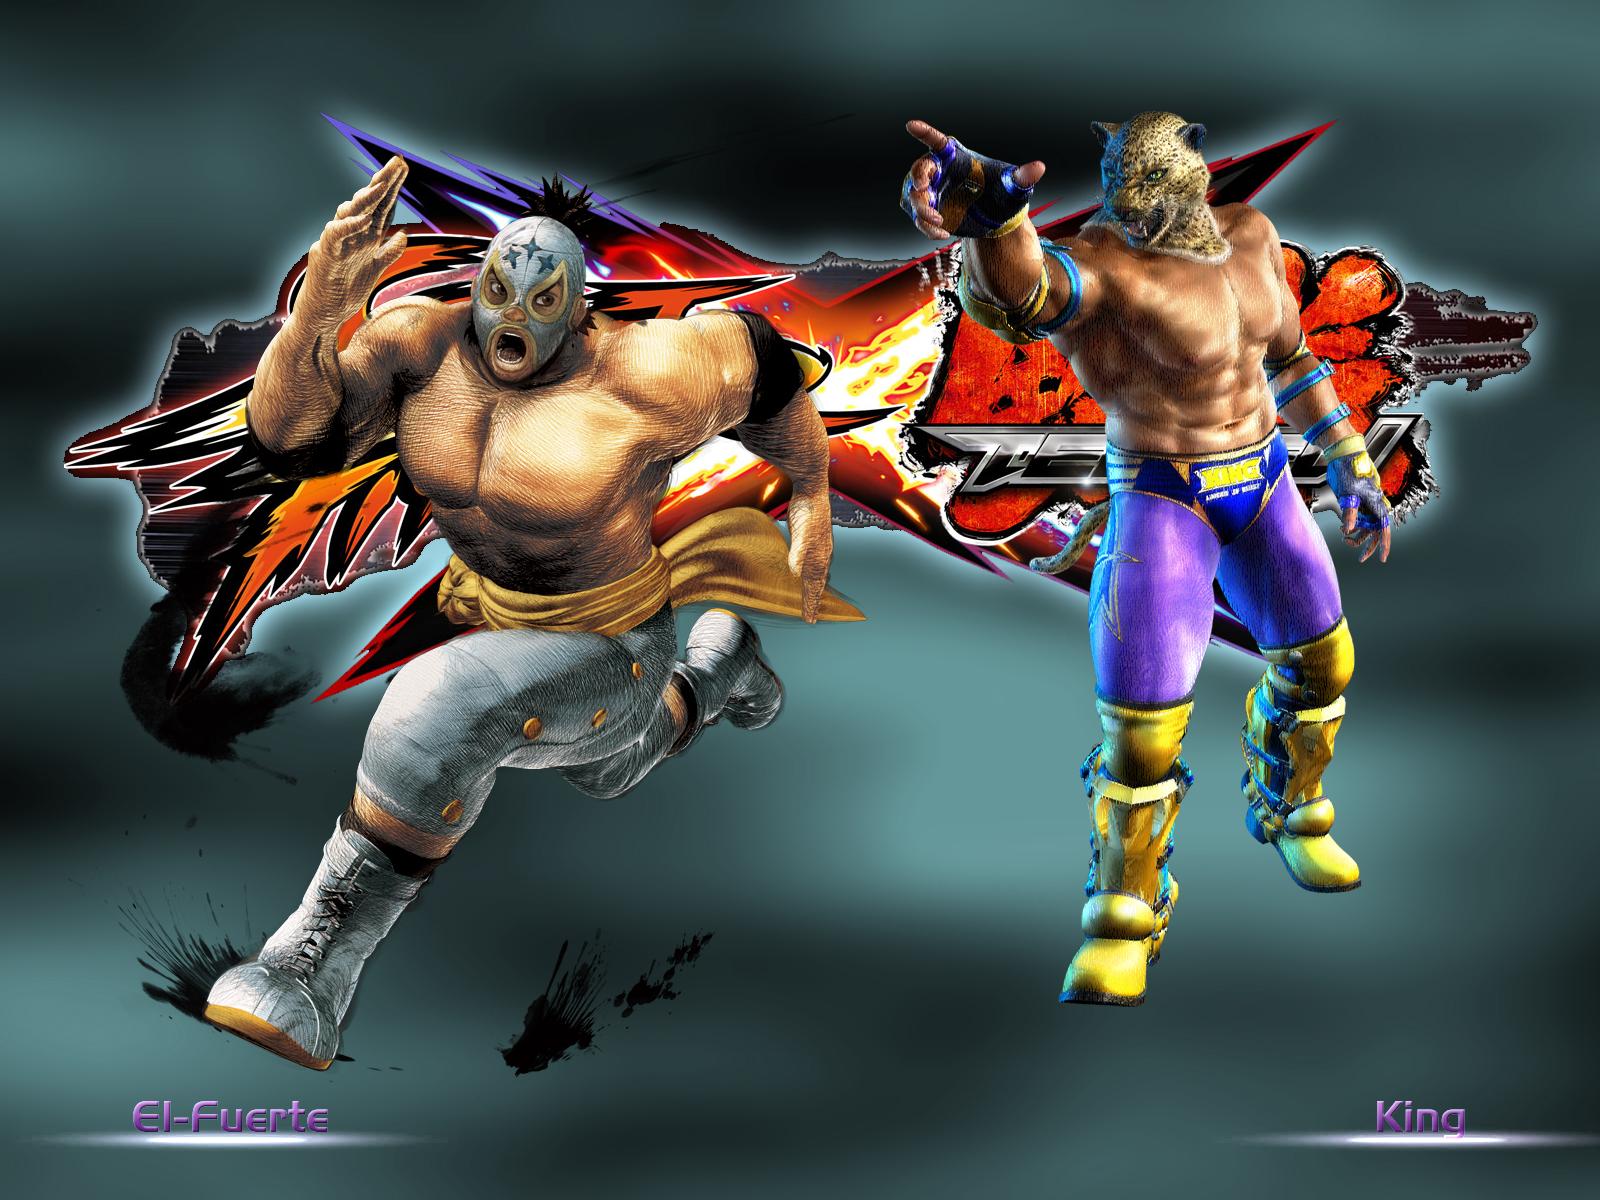 El Fuerte vs King - SFxTekken by khotebabu